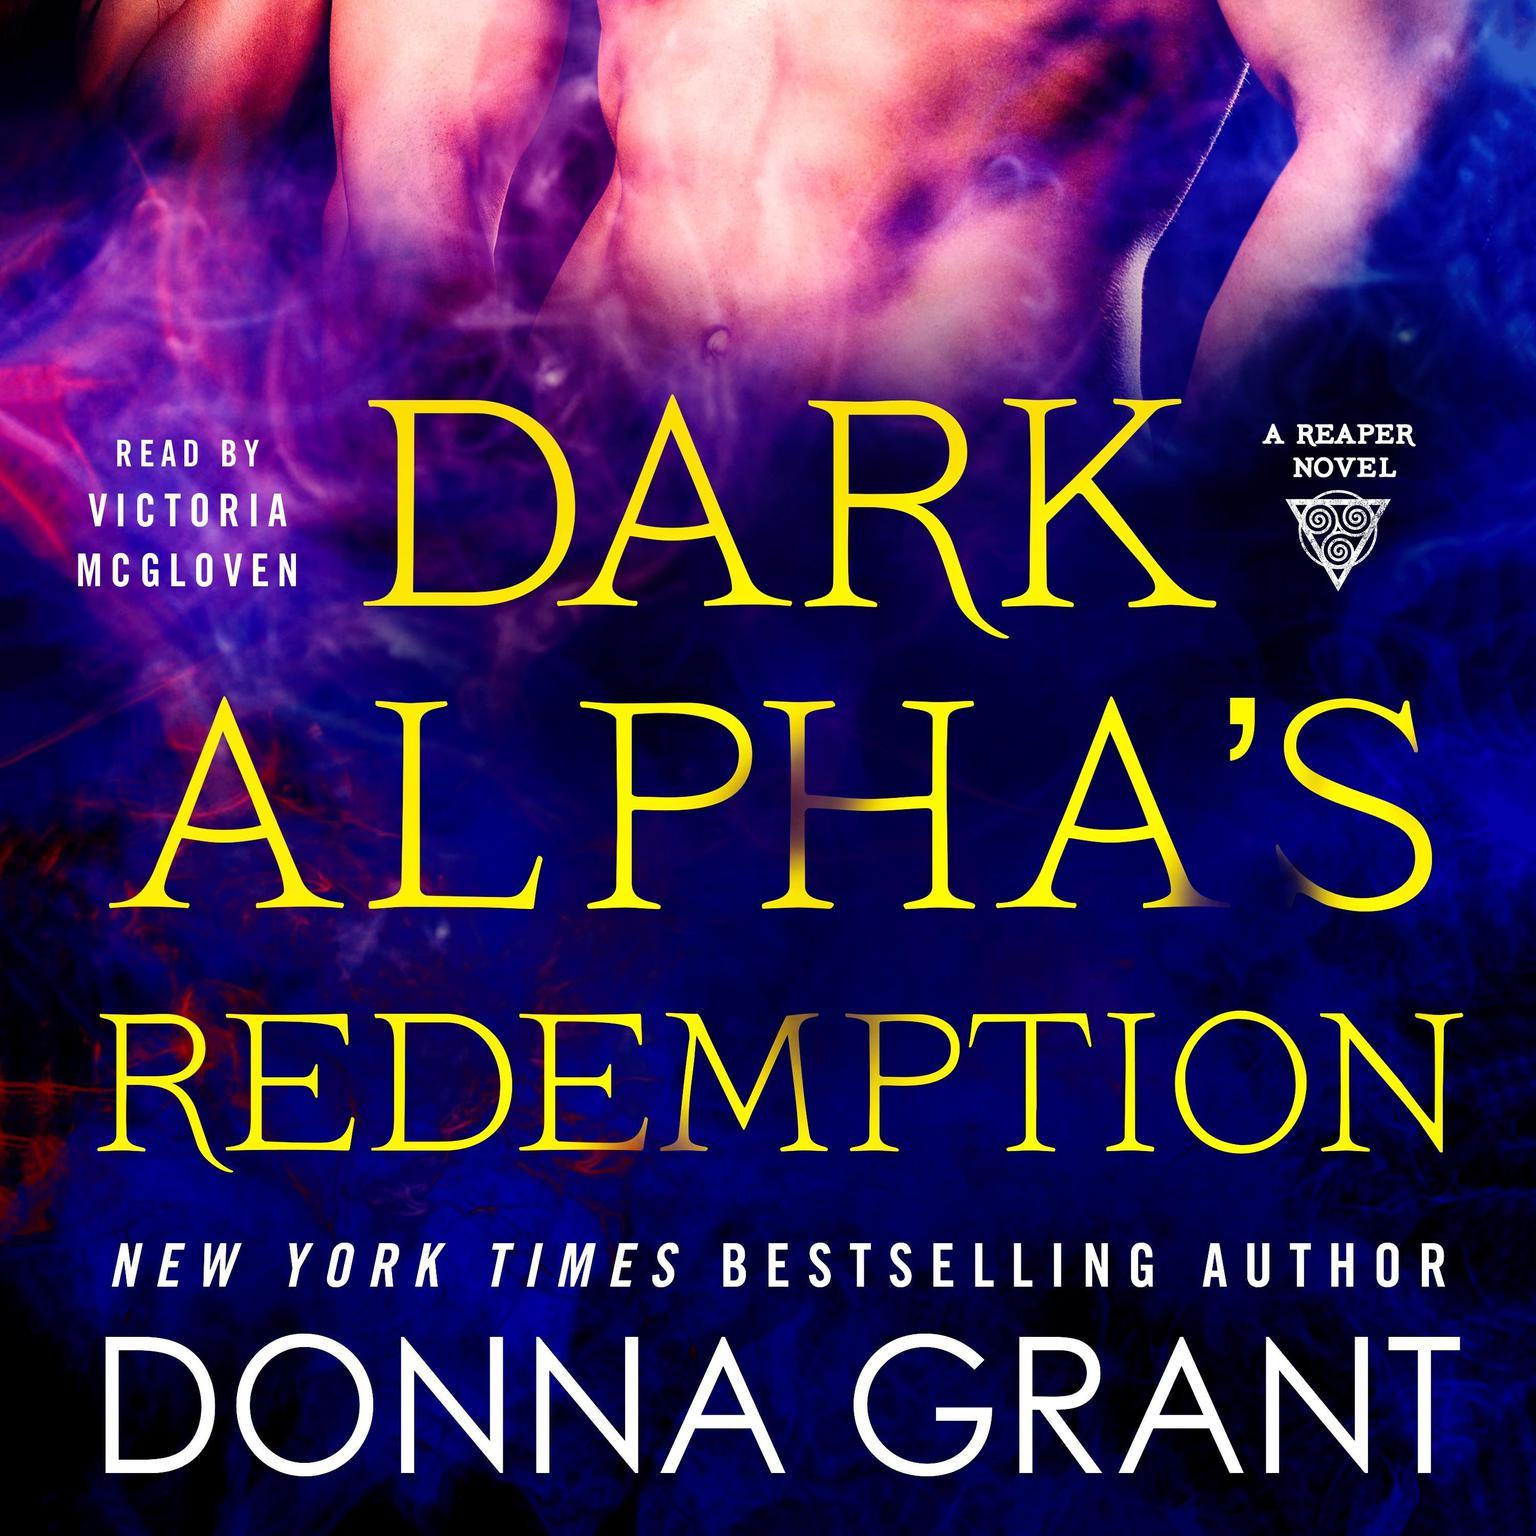 Printable Dark Alpha's Redemption: A Reaper Novel Audiobook Cover Art